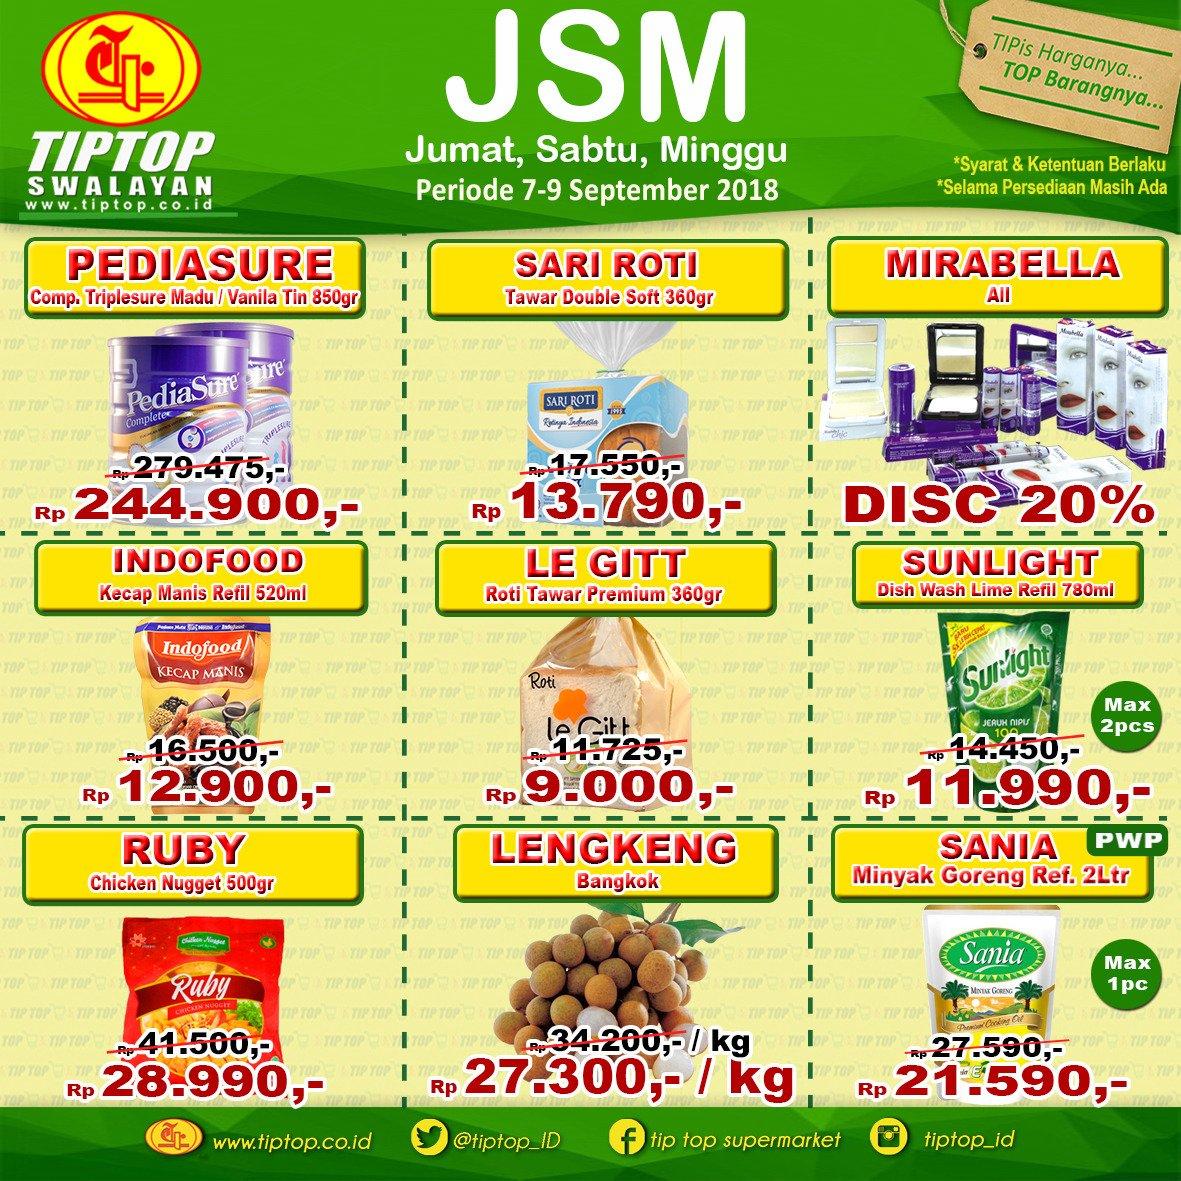 TipTop - Katalog Promo JSM Periode 07 - 09 September 2018